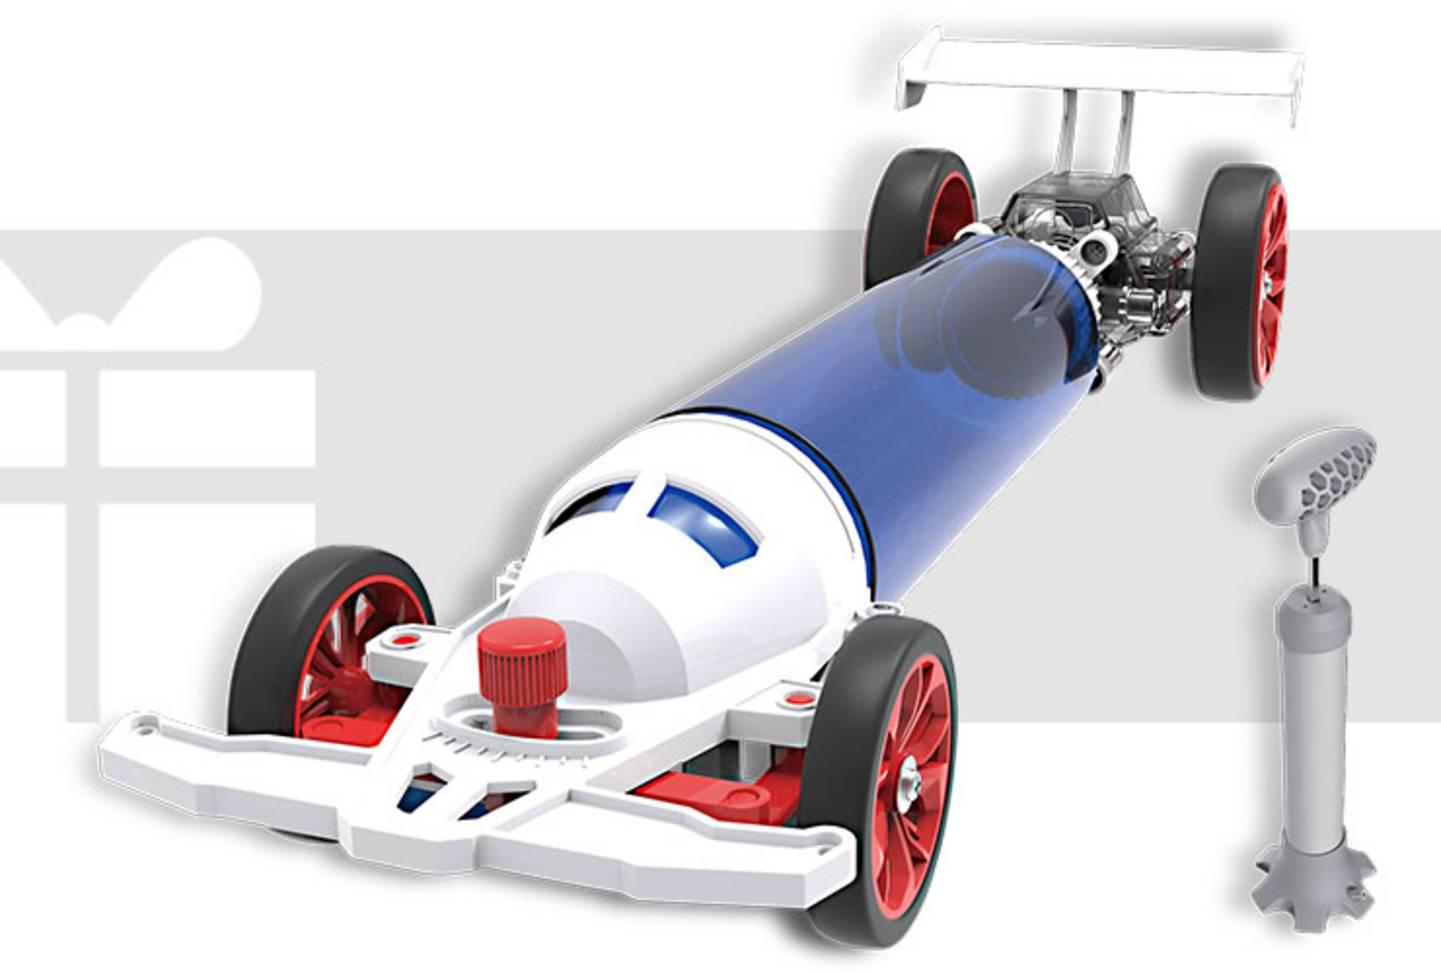 Makerfactory - Turbo Racer